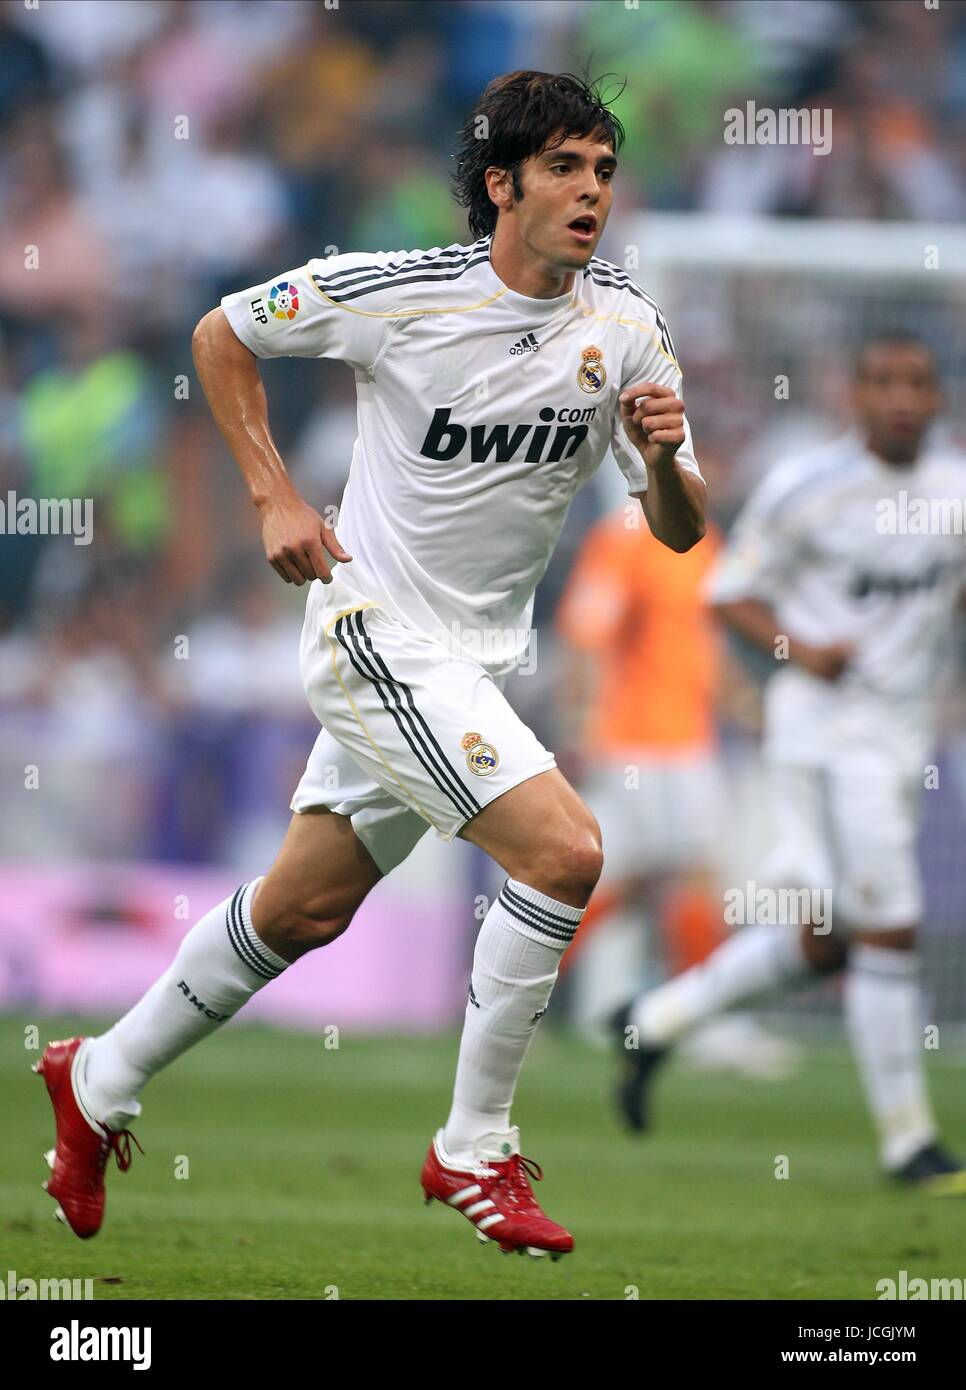 500+ Real Madrid And Kaka